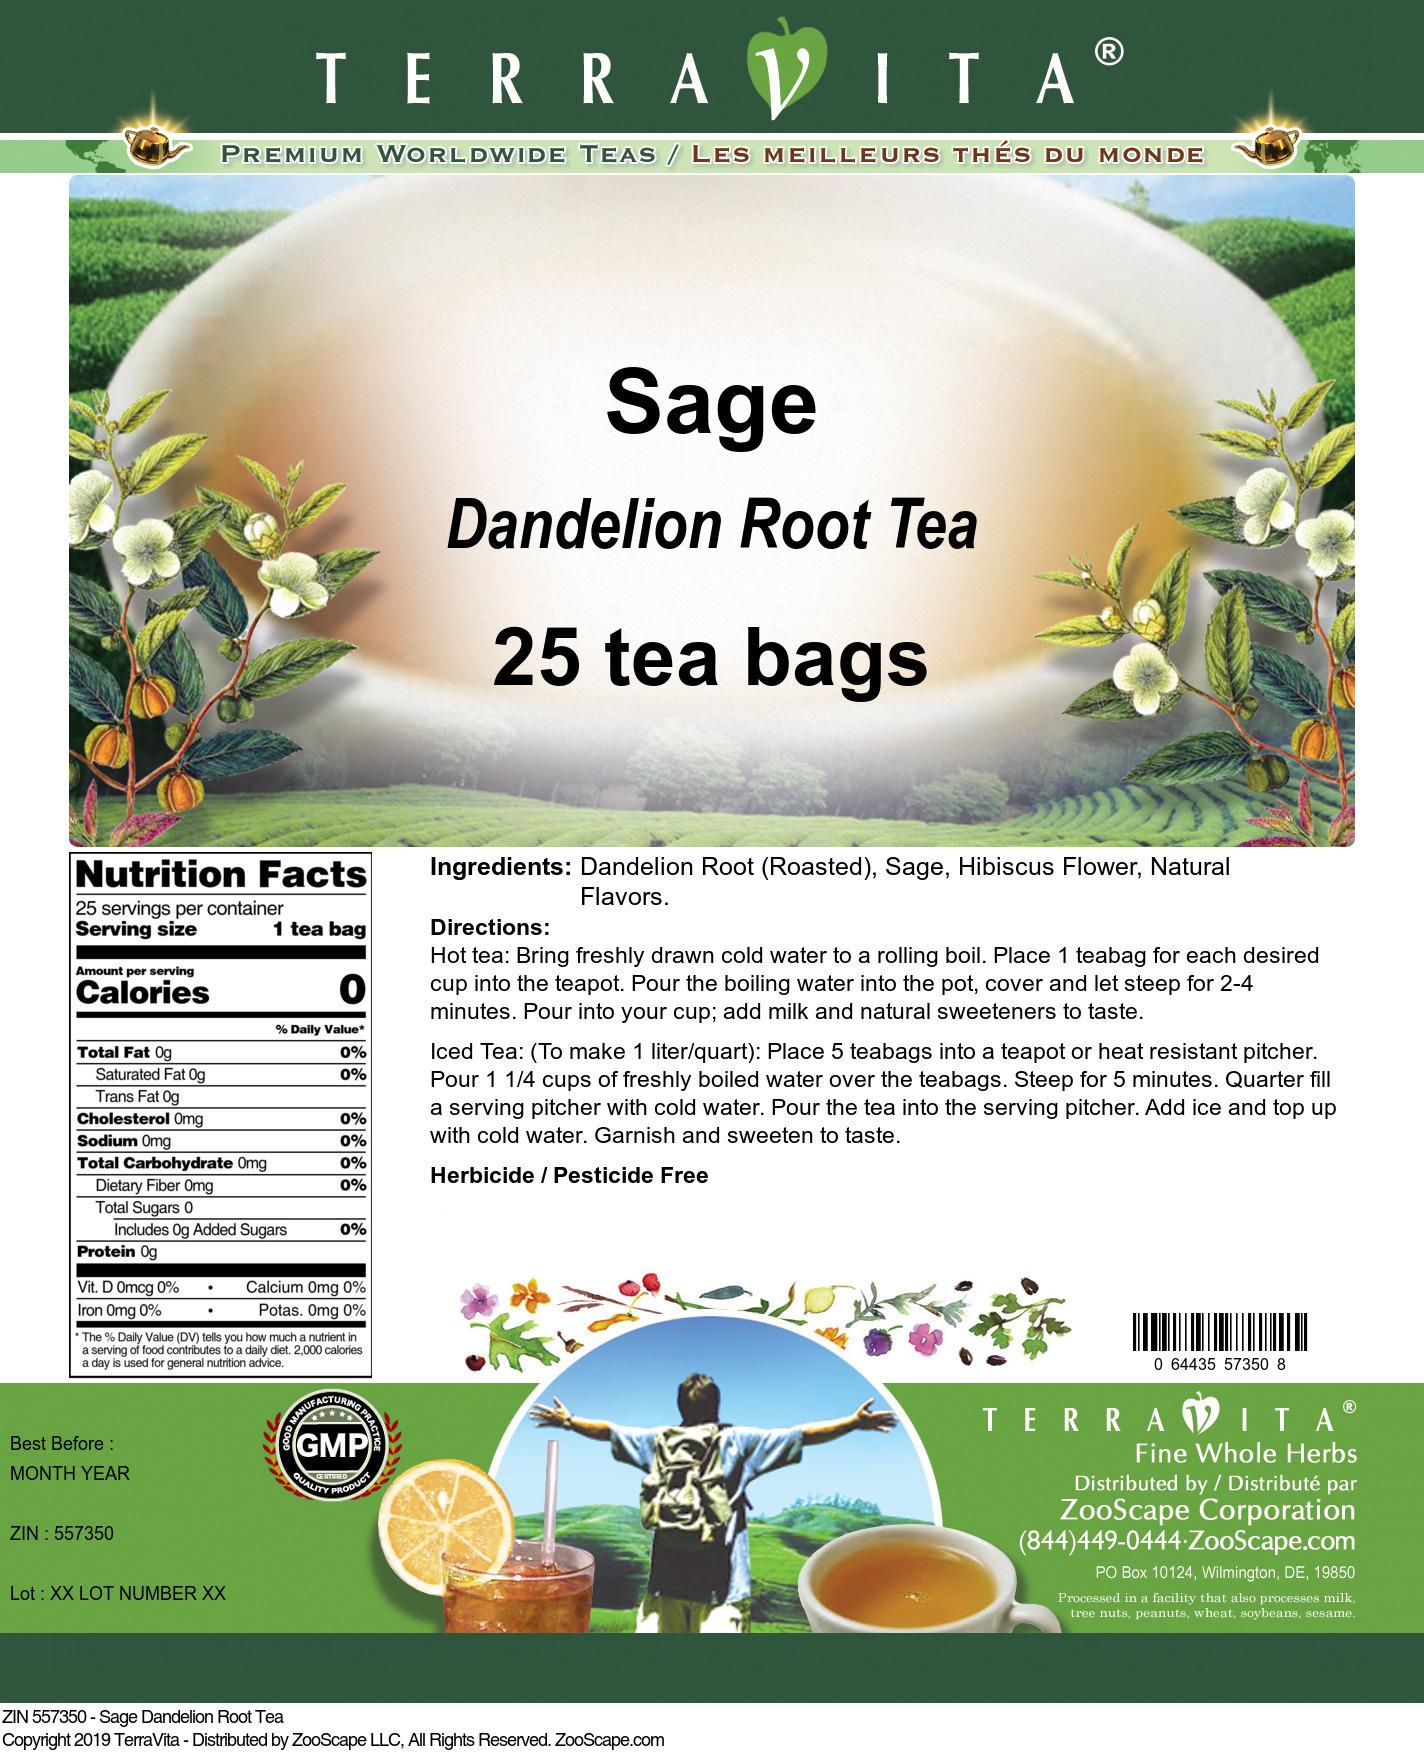 Sage Dandelion Root Tea